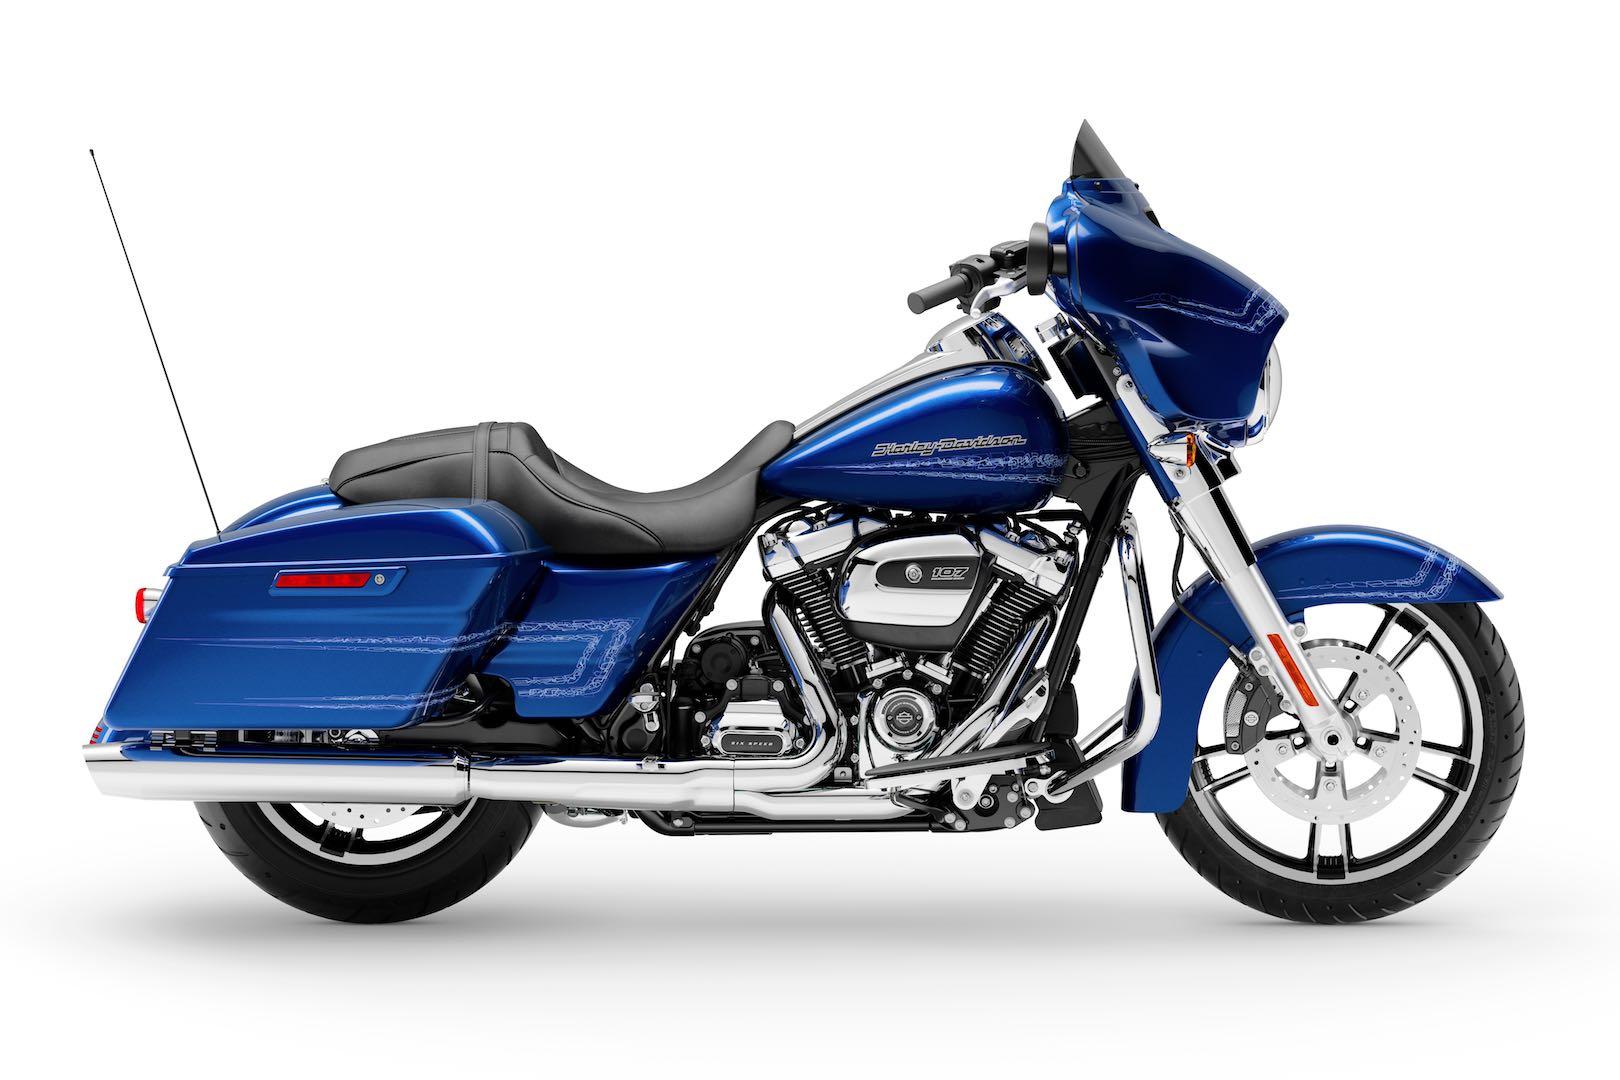 2020 Harley Davidson Street Glide Buyer S Guide Specs Price